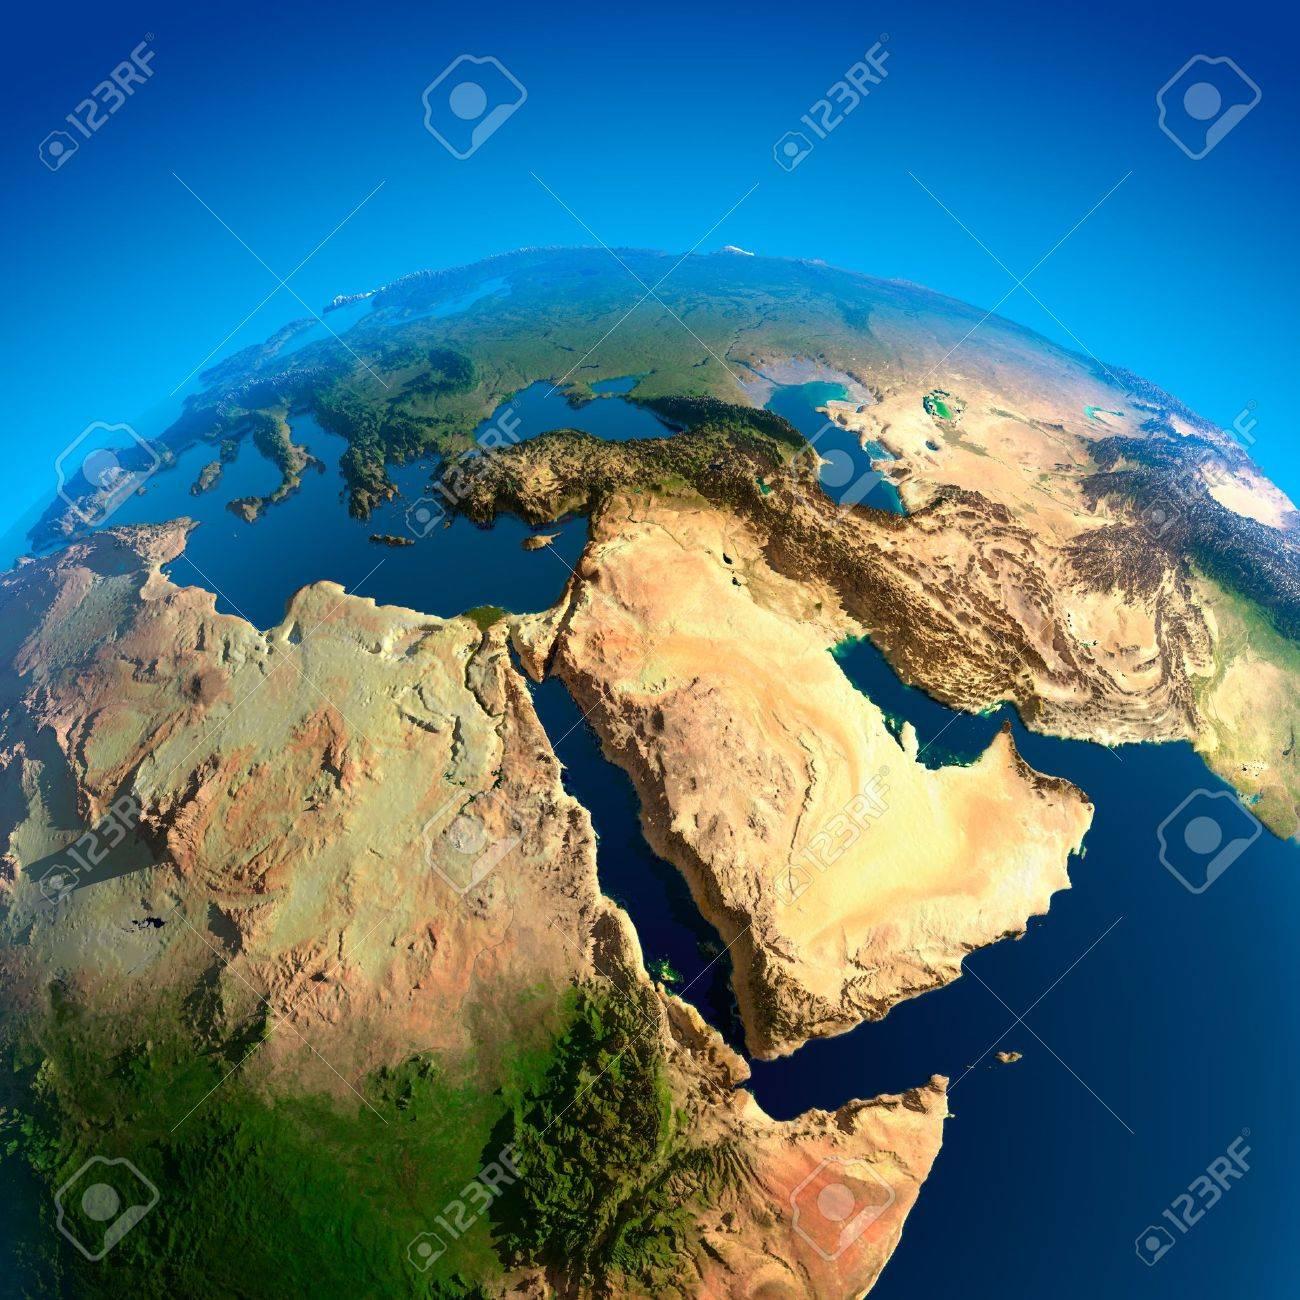 Egypt, Sudan, Ethiopia, Somalia, Saudi Arabia and other countries